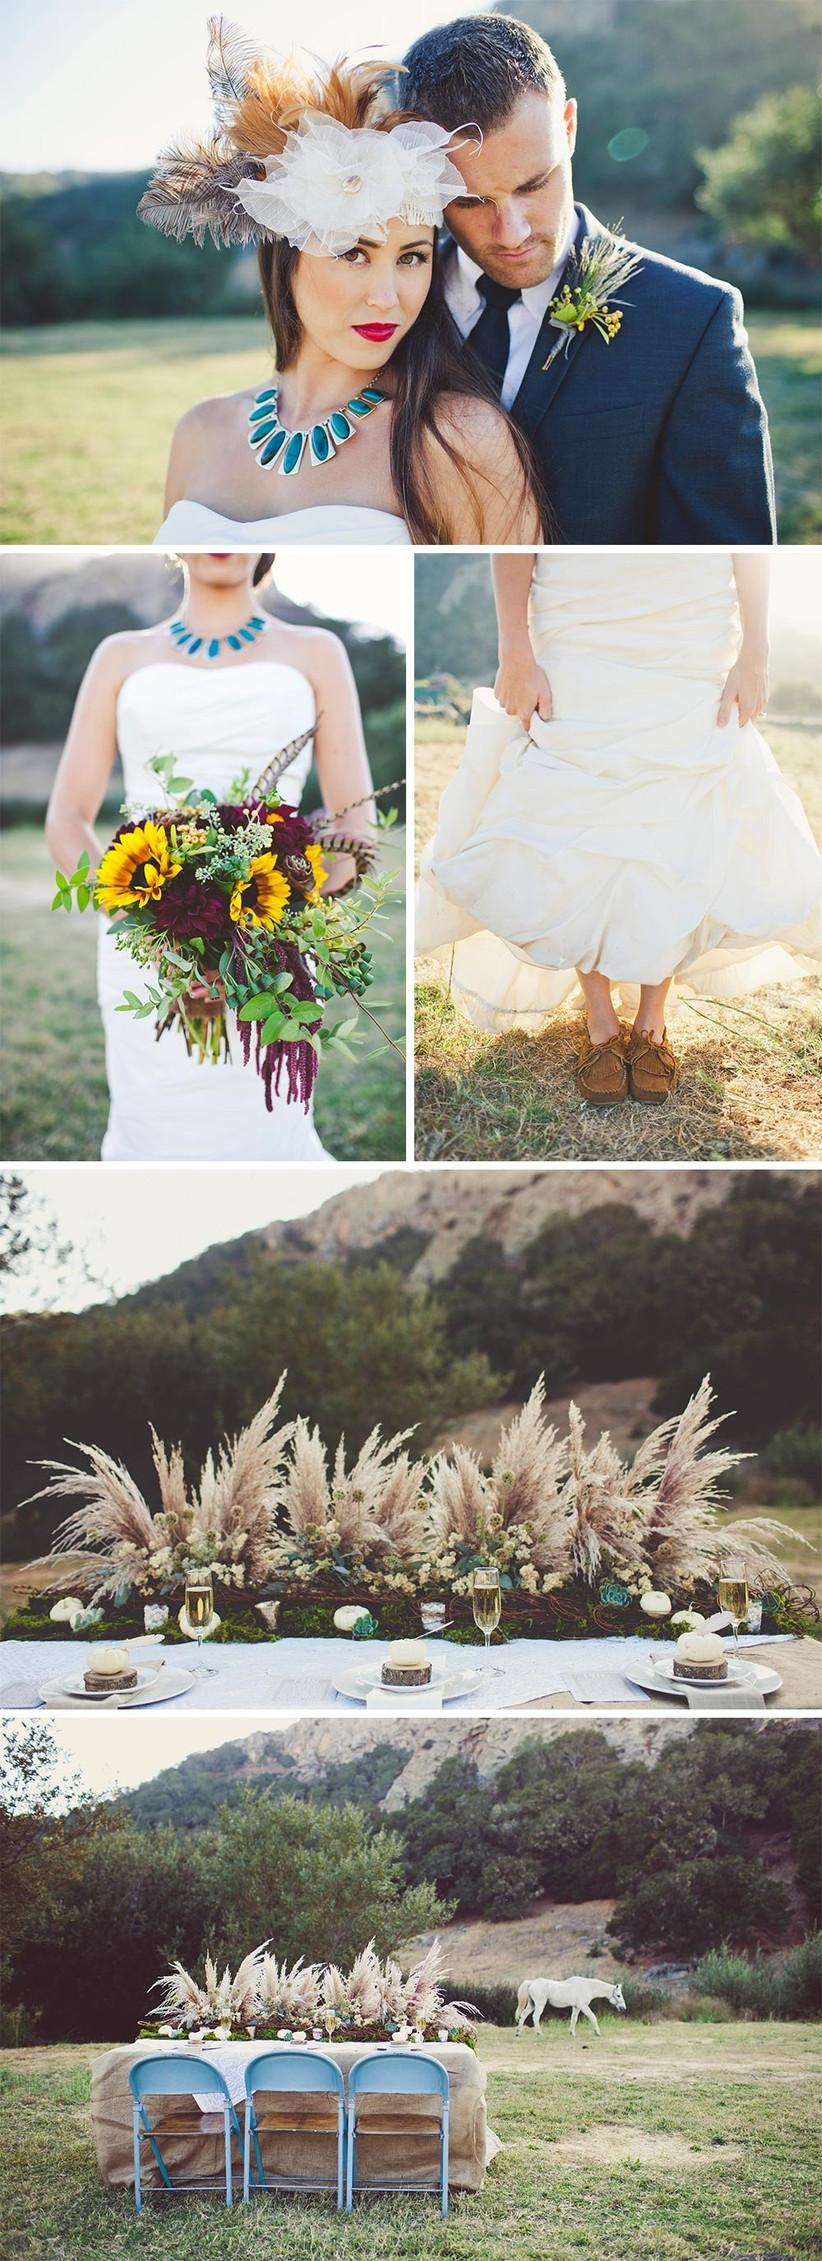 unusual-wedding-theme-pocahontas-style-wedding